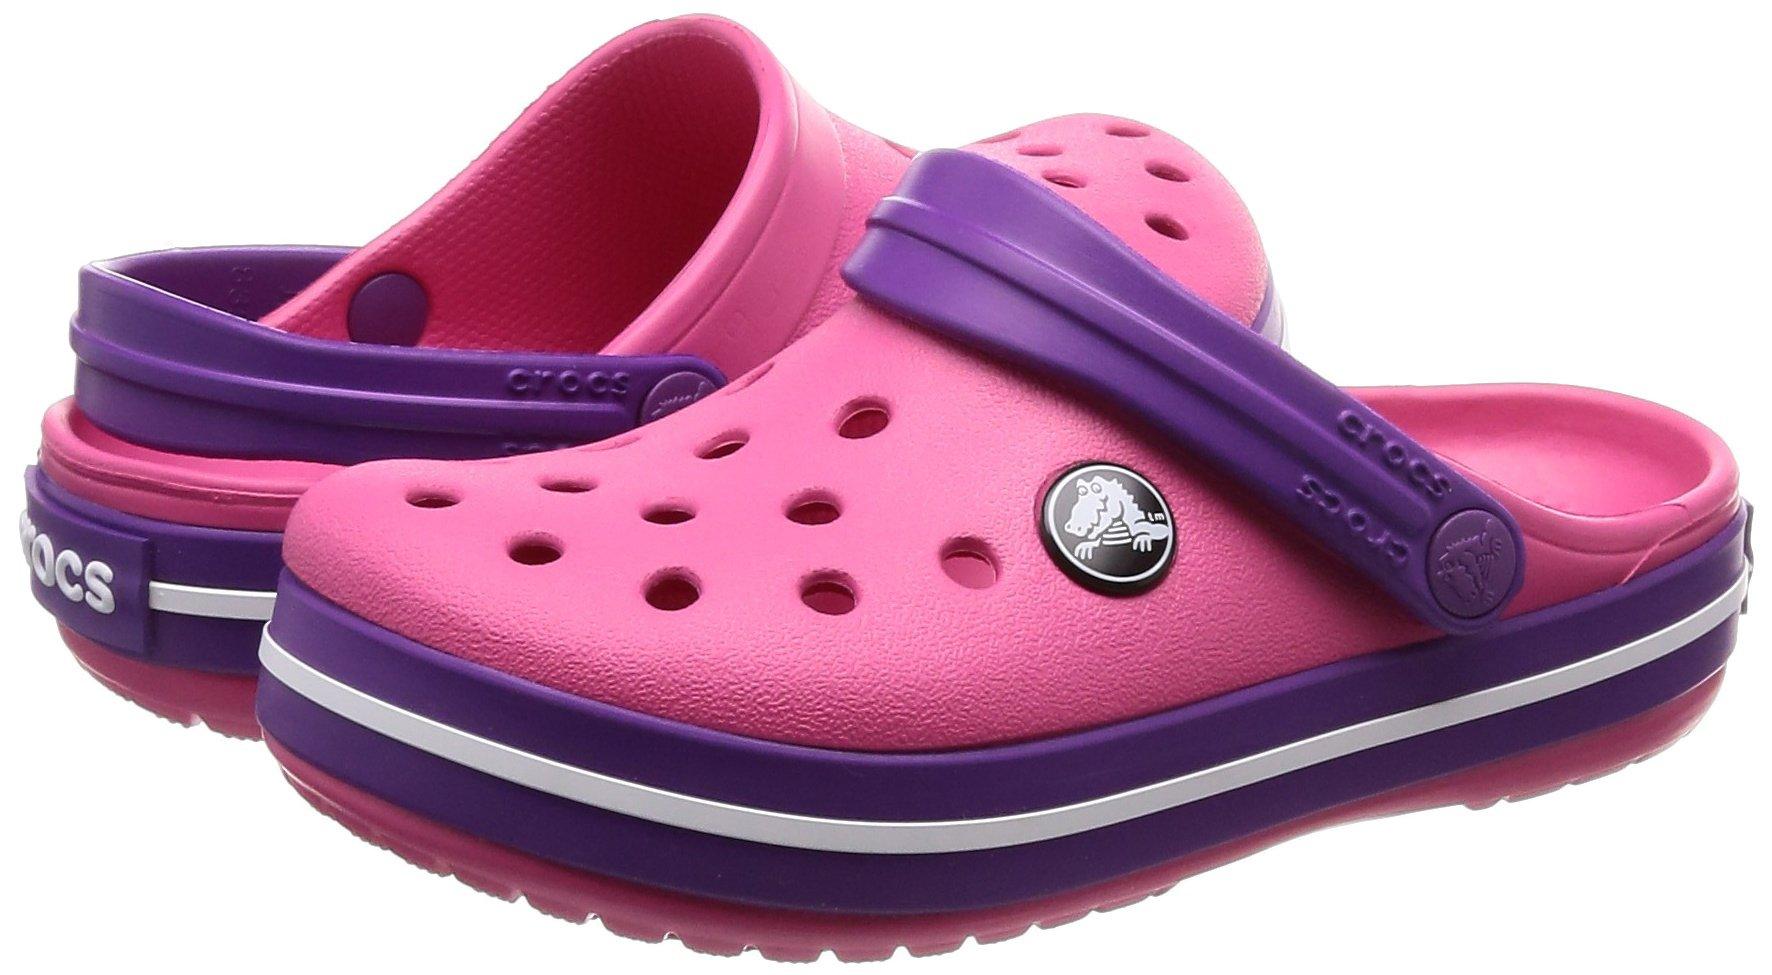 Crocs Kids' Crocband Clog, Paradise Pink/Amethyst, 1 M US Little by Crocs (Image #5)